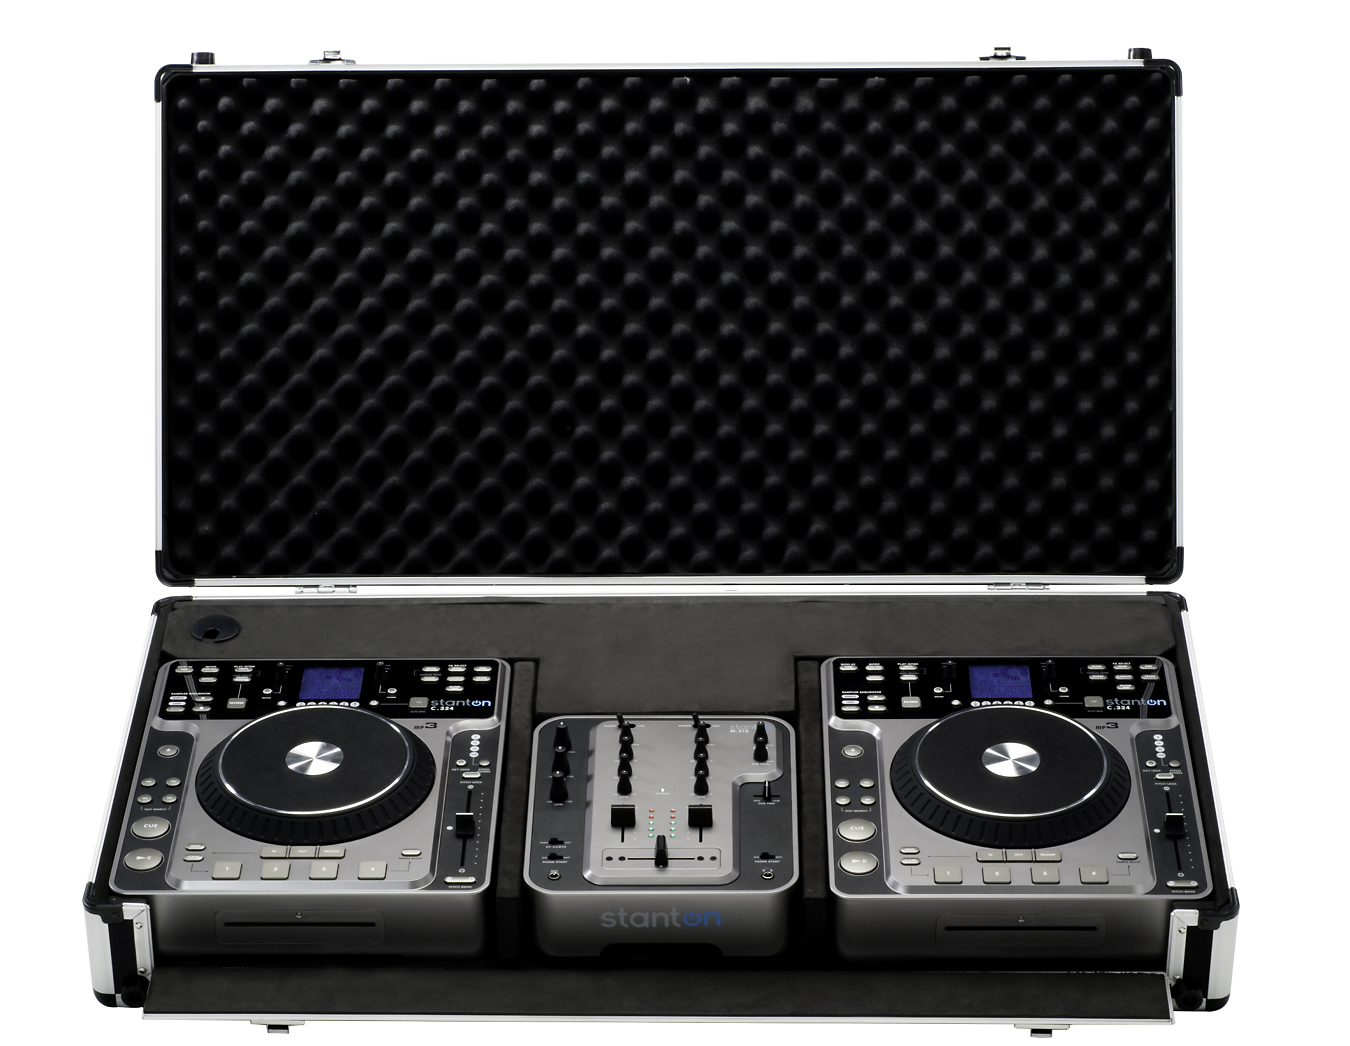 Lot 20 - 2 X STANTON DIGIPAK PRO.V4 DJ TURNTABLE AUDIO PORTABLE SYSTEMS